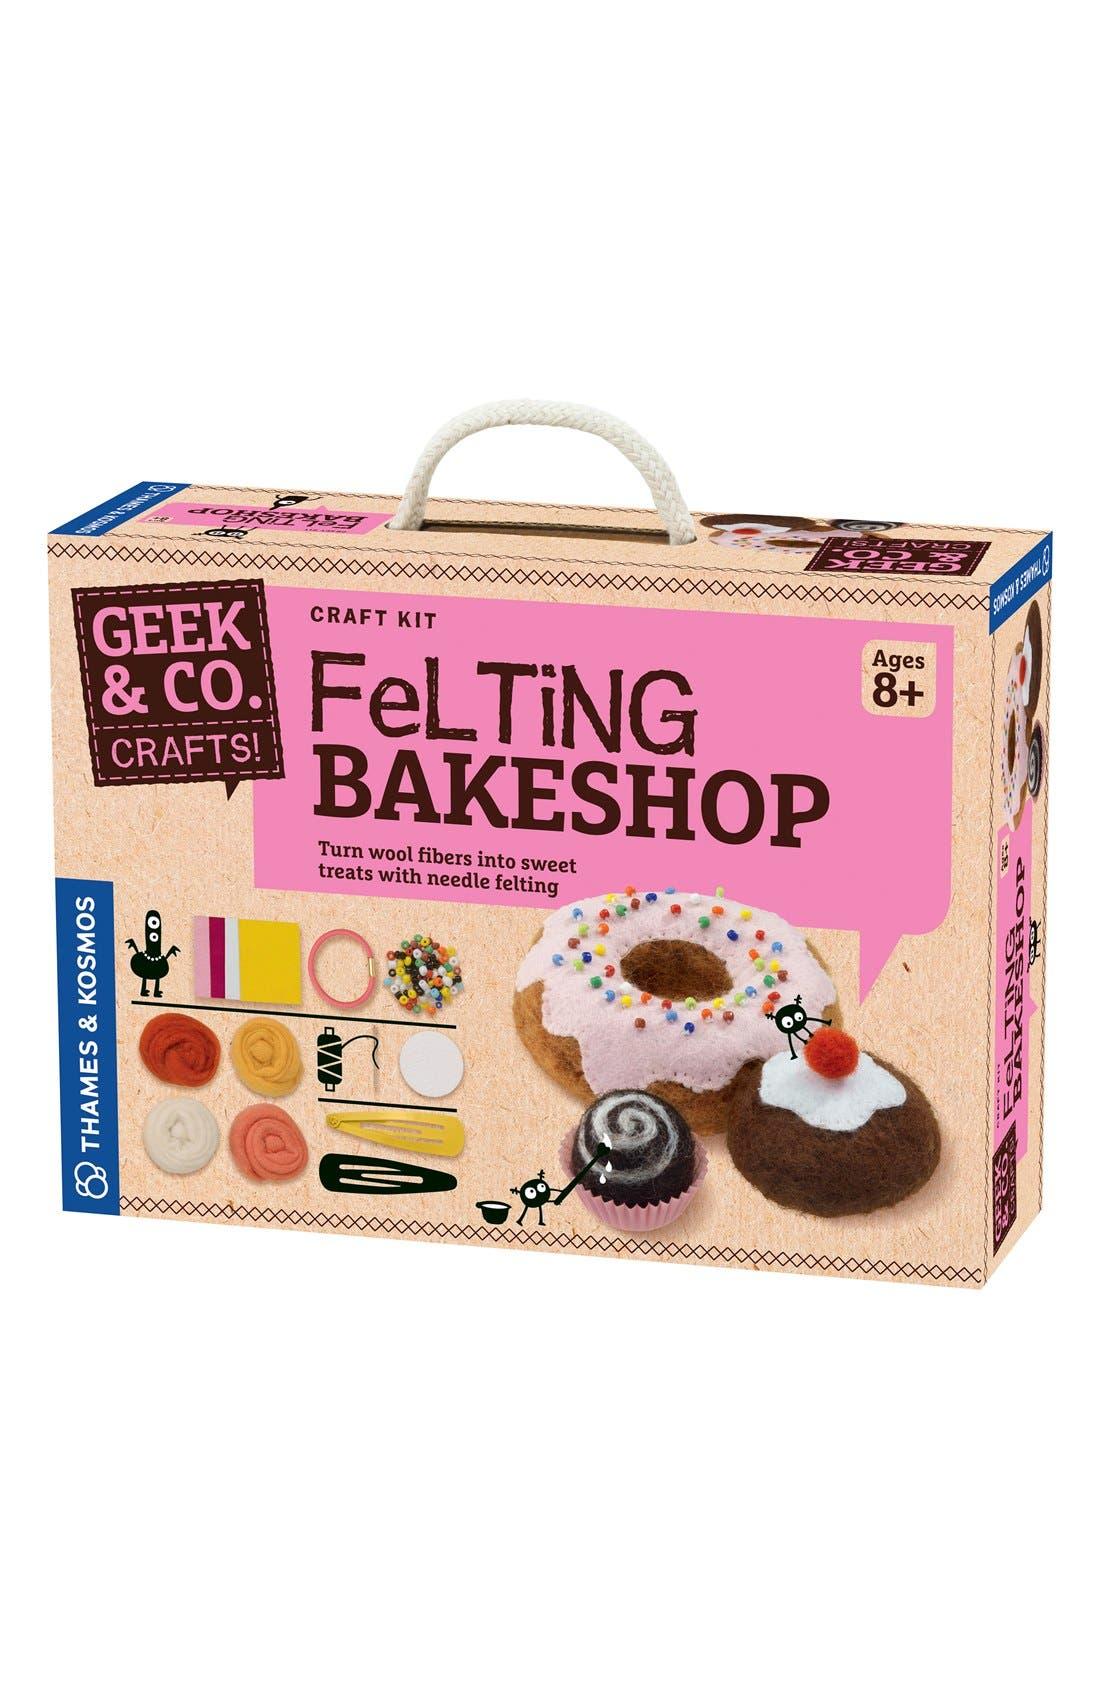 Thames & Kosmos 'Felting Bakeshop' Craft Kit